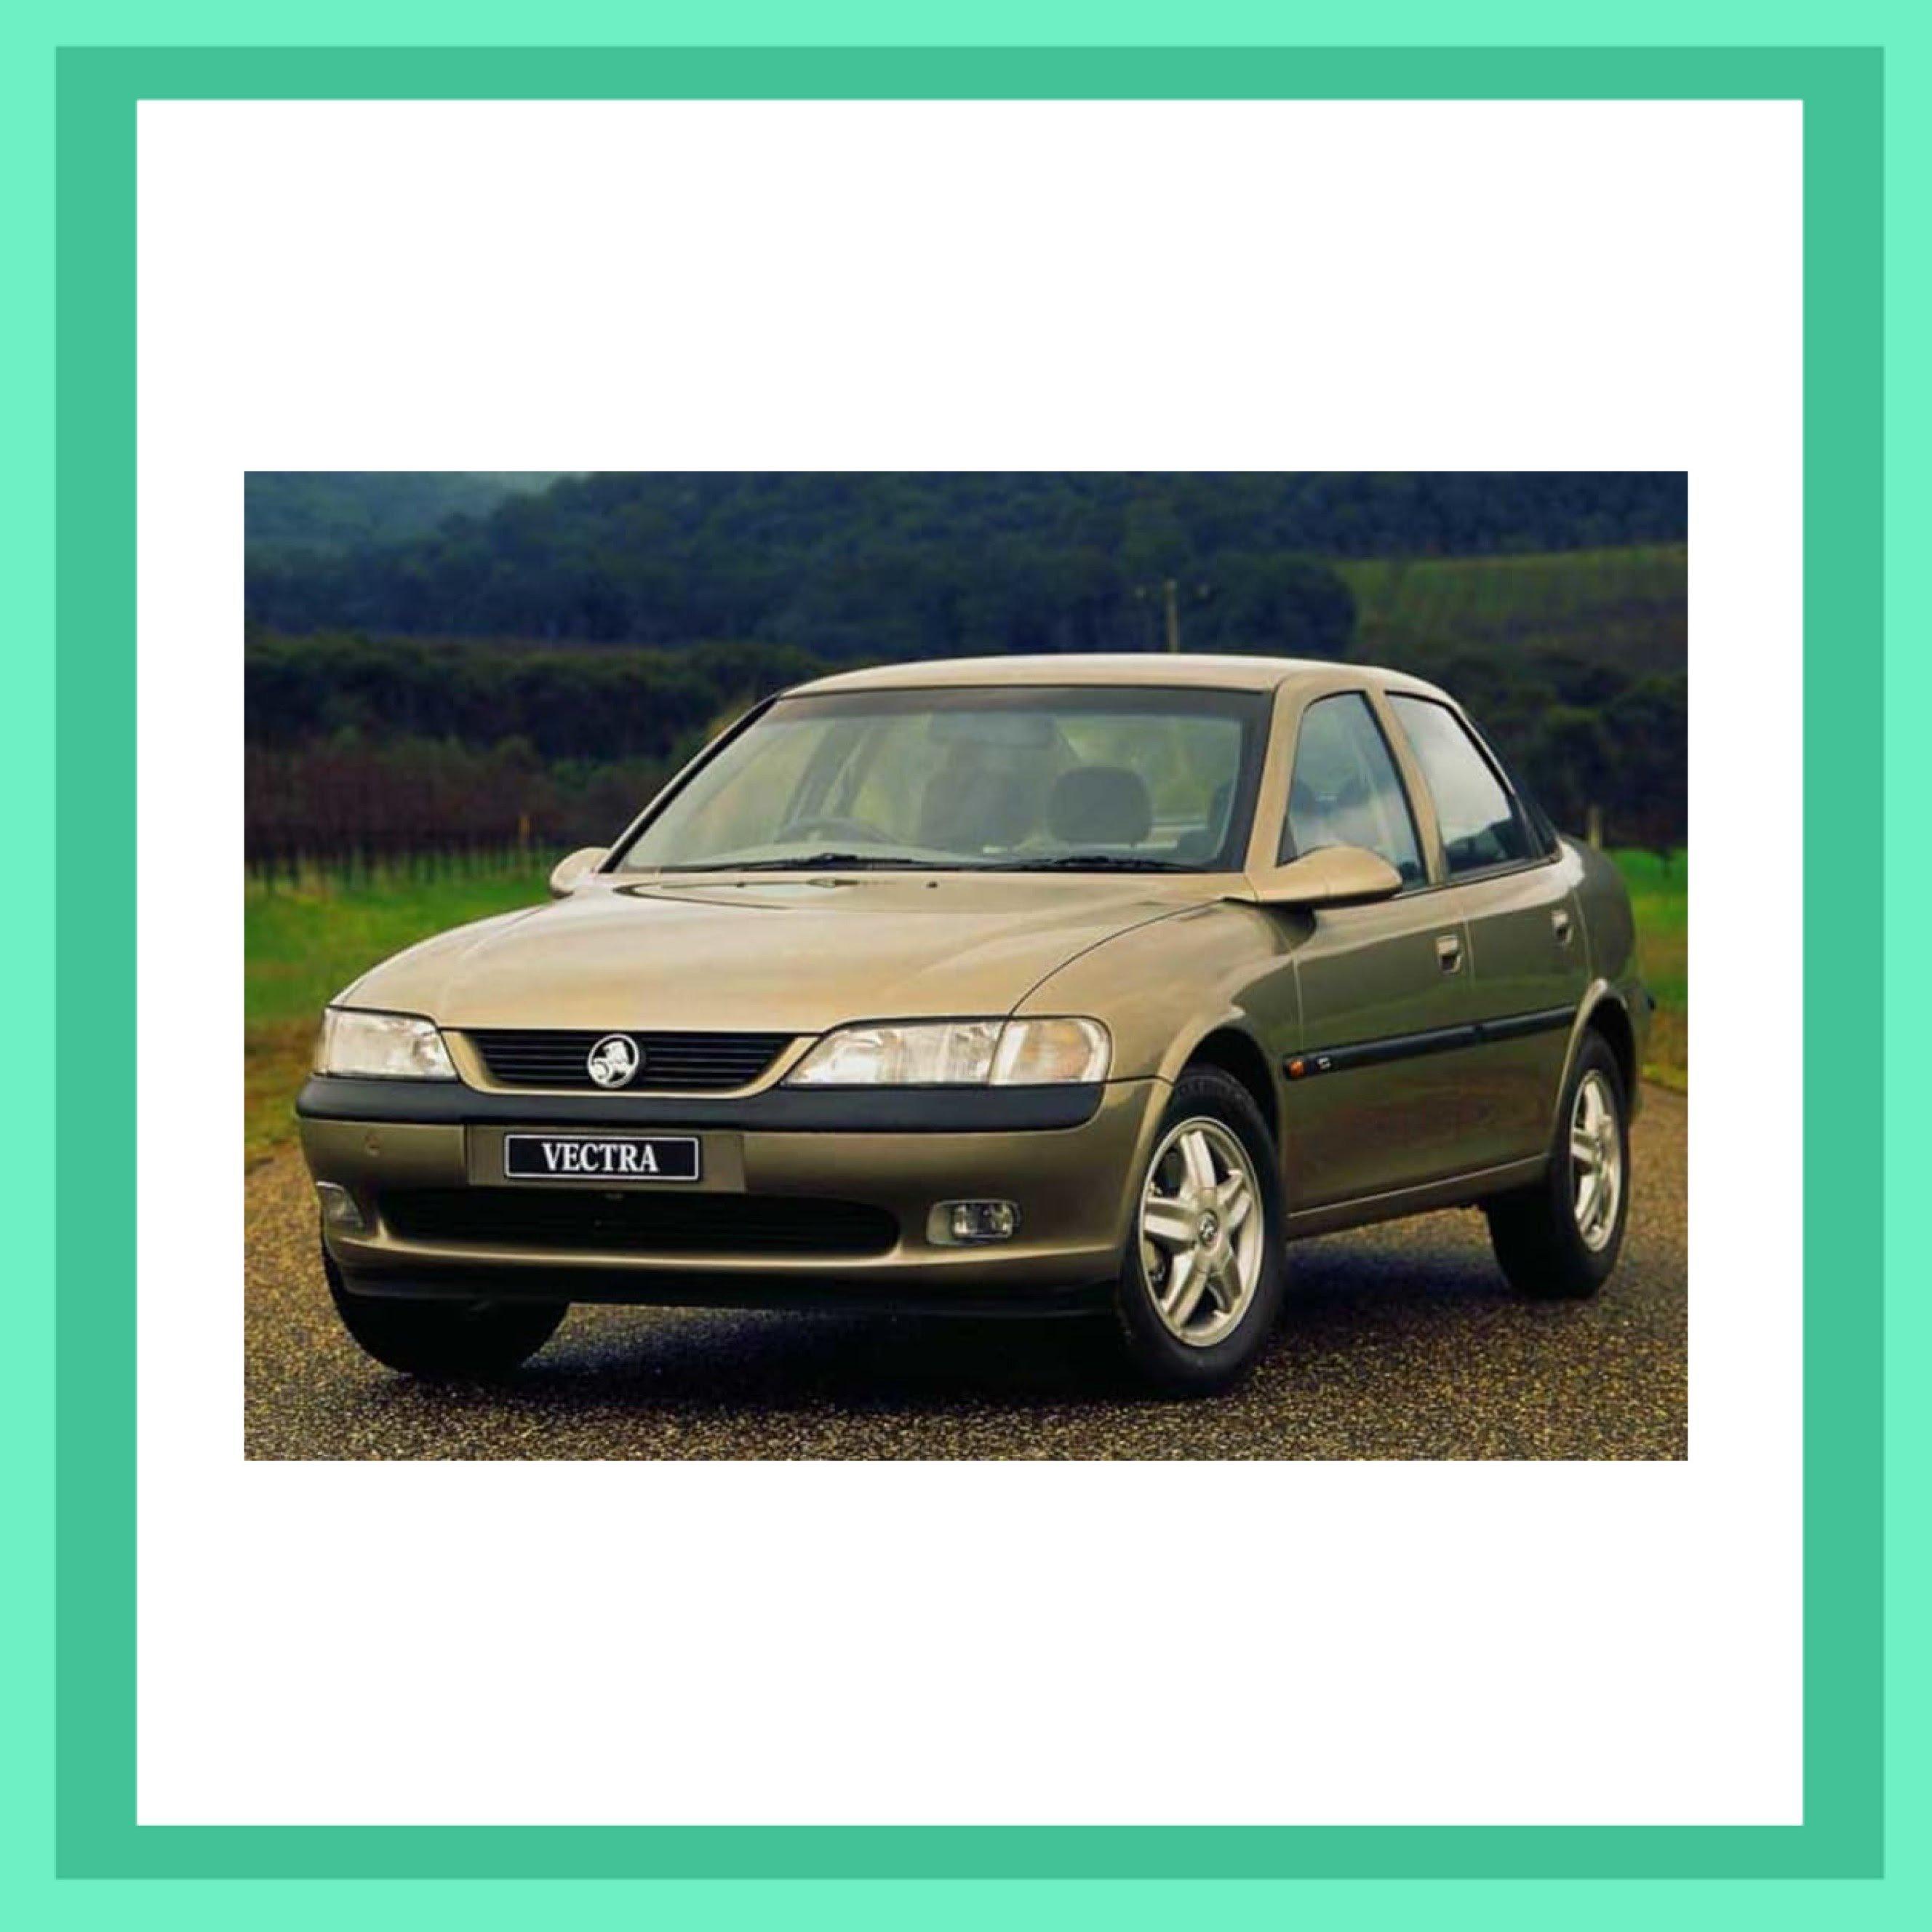 Vectra JR 1997 - 1998